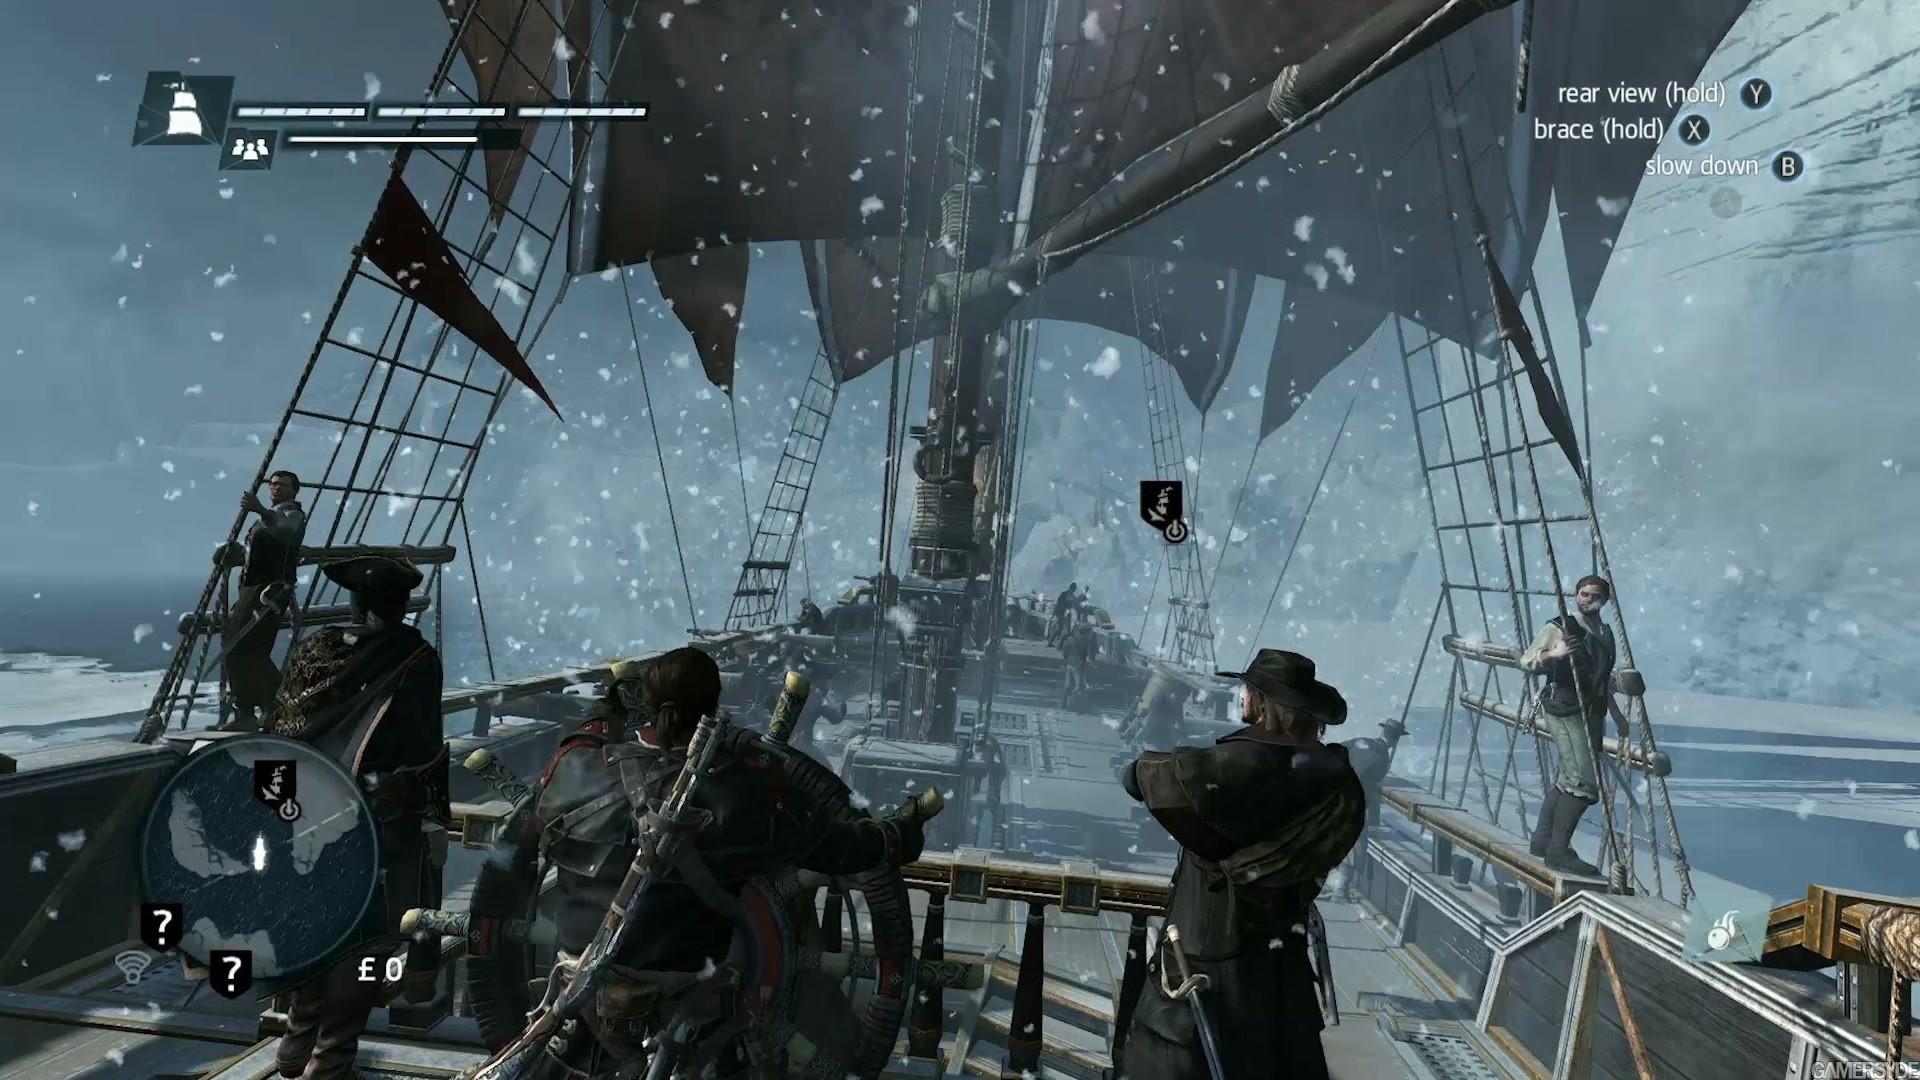 74 Assassins Creed Rogue Wallpaper 1080p